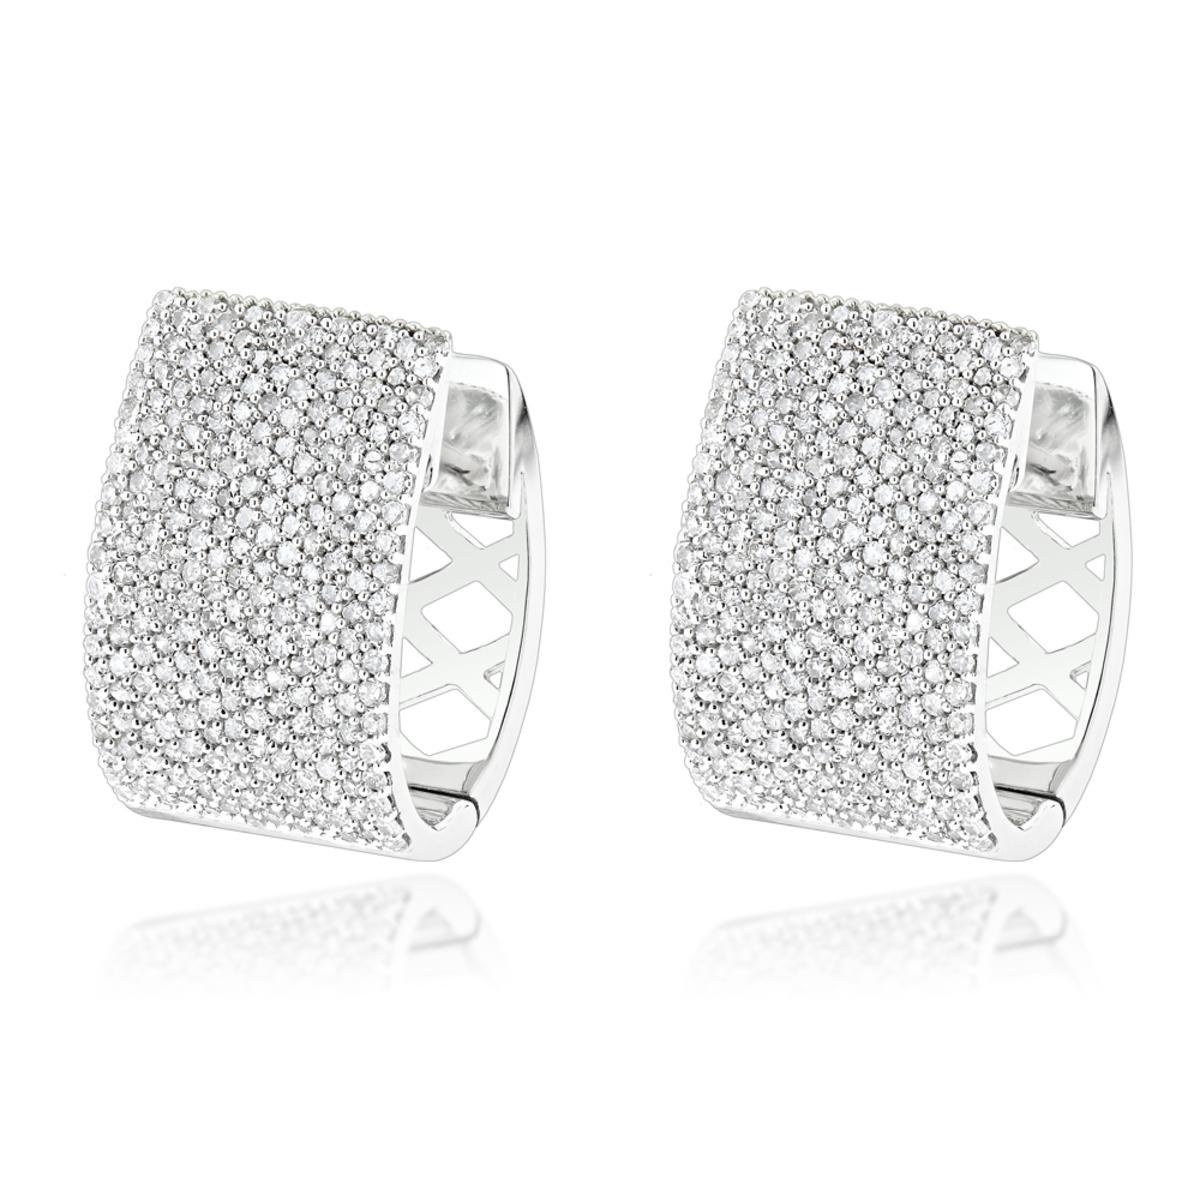 Pave Diamond Earrings for Women 14K Gold 1 Carat Small Wide Hoops